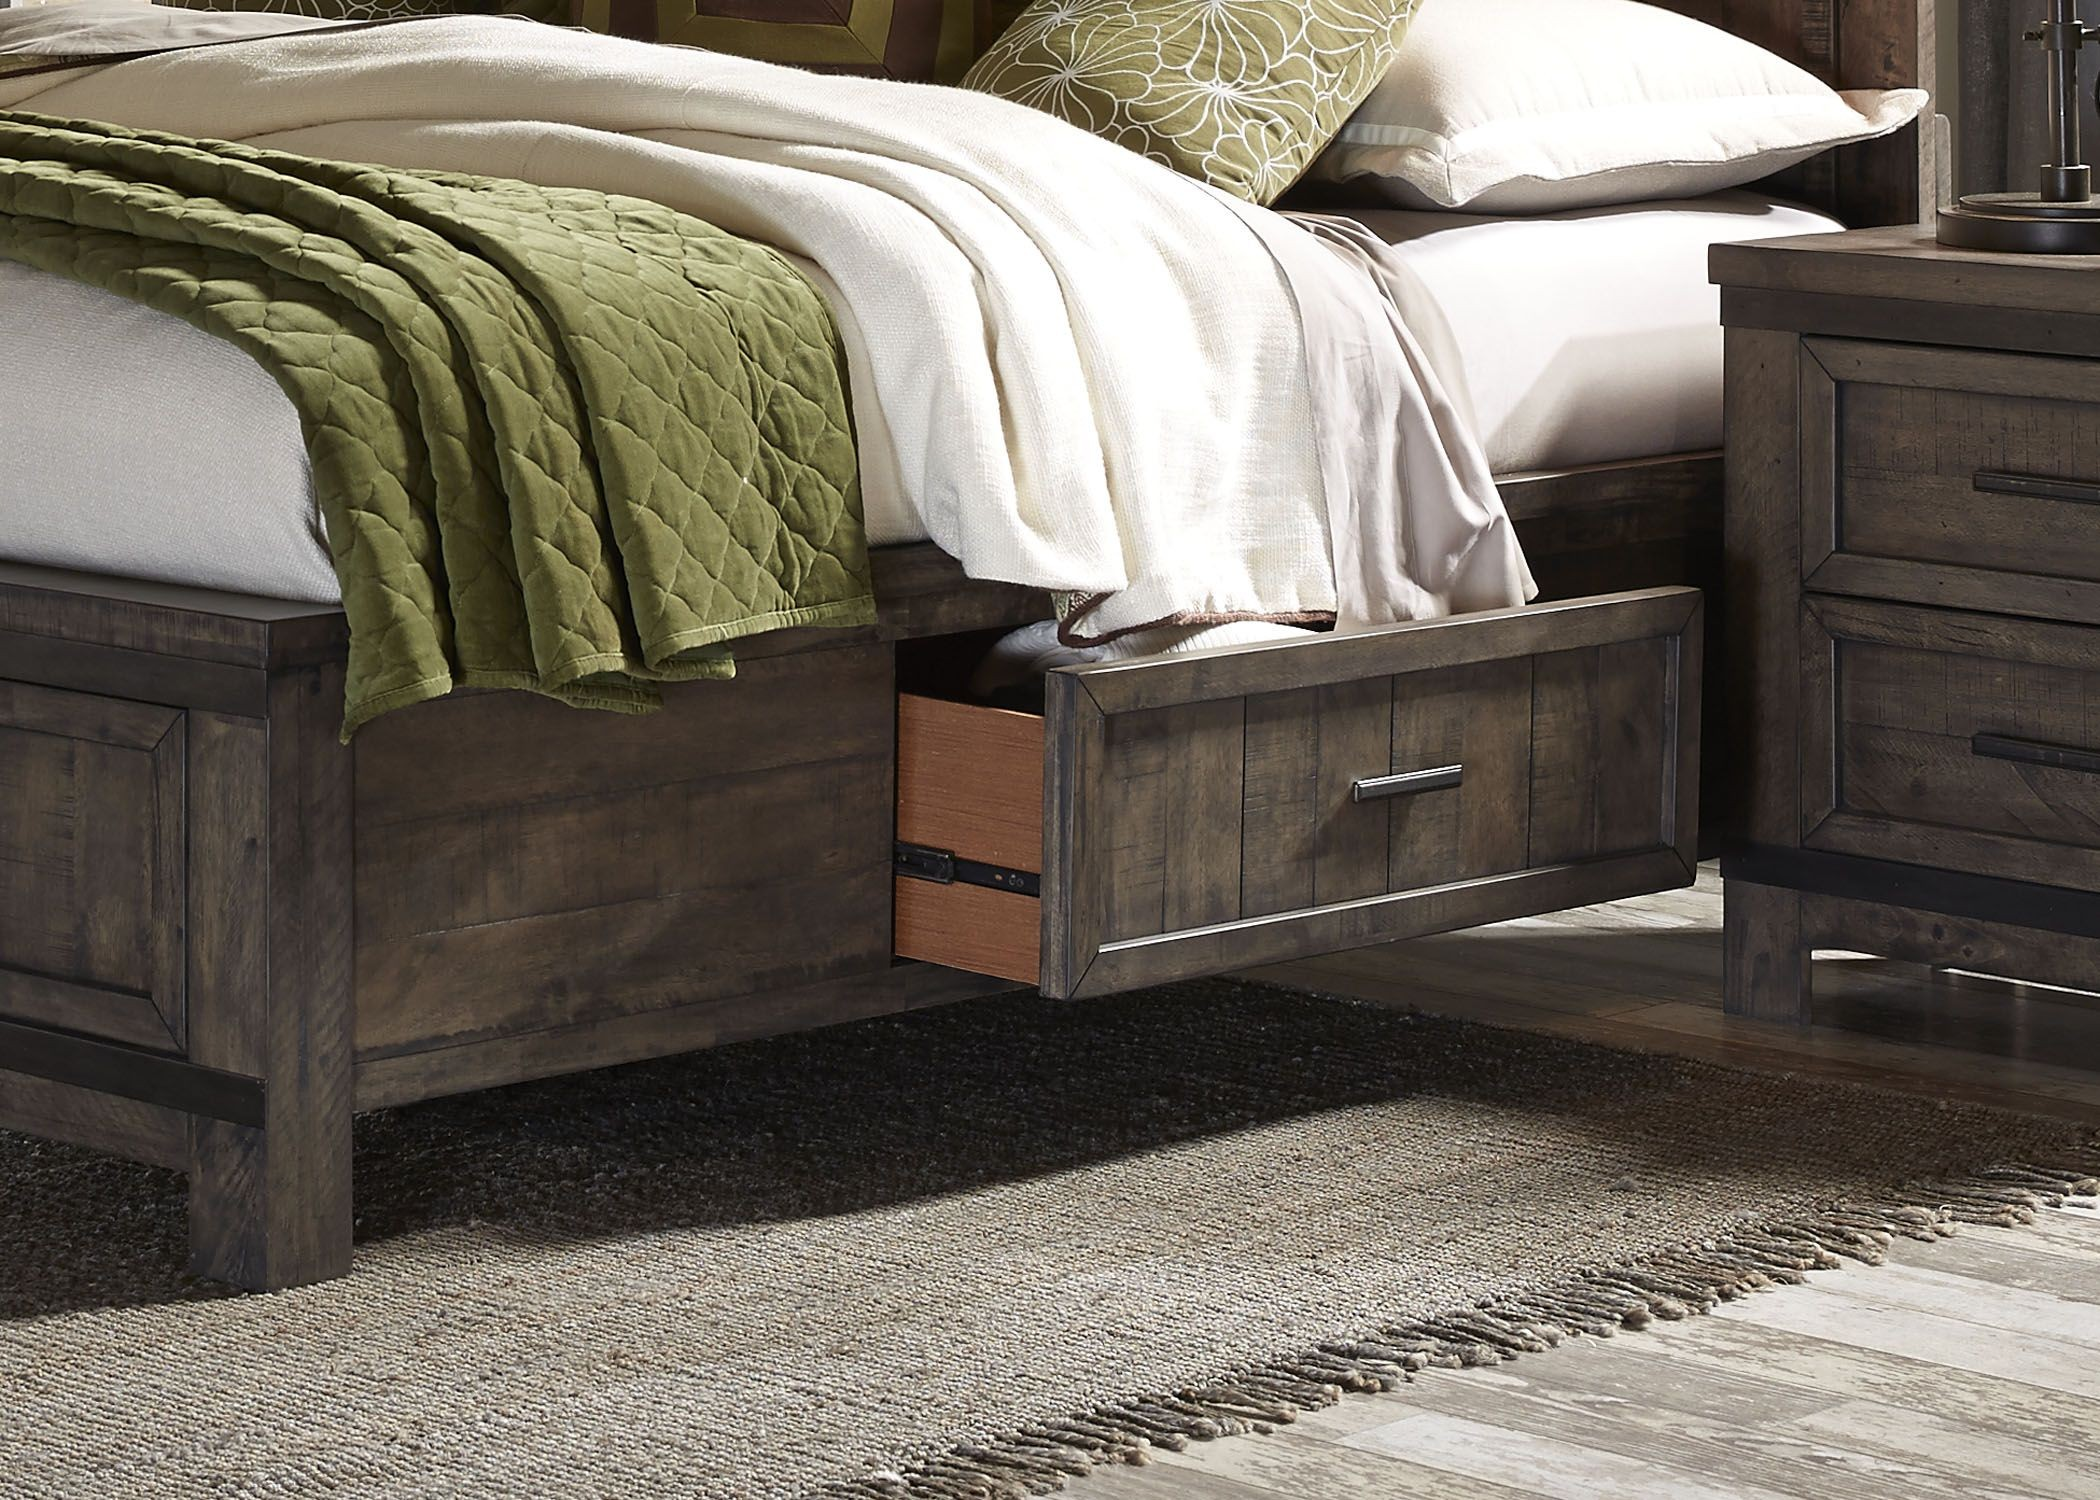 thornwood hills rock beaten gray two sided panel storage thornwood beds store bigfurniturewebsite stylish